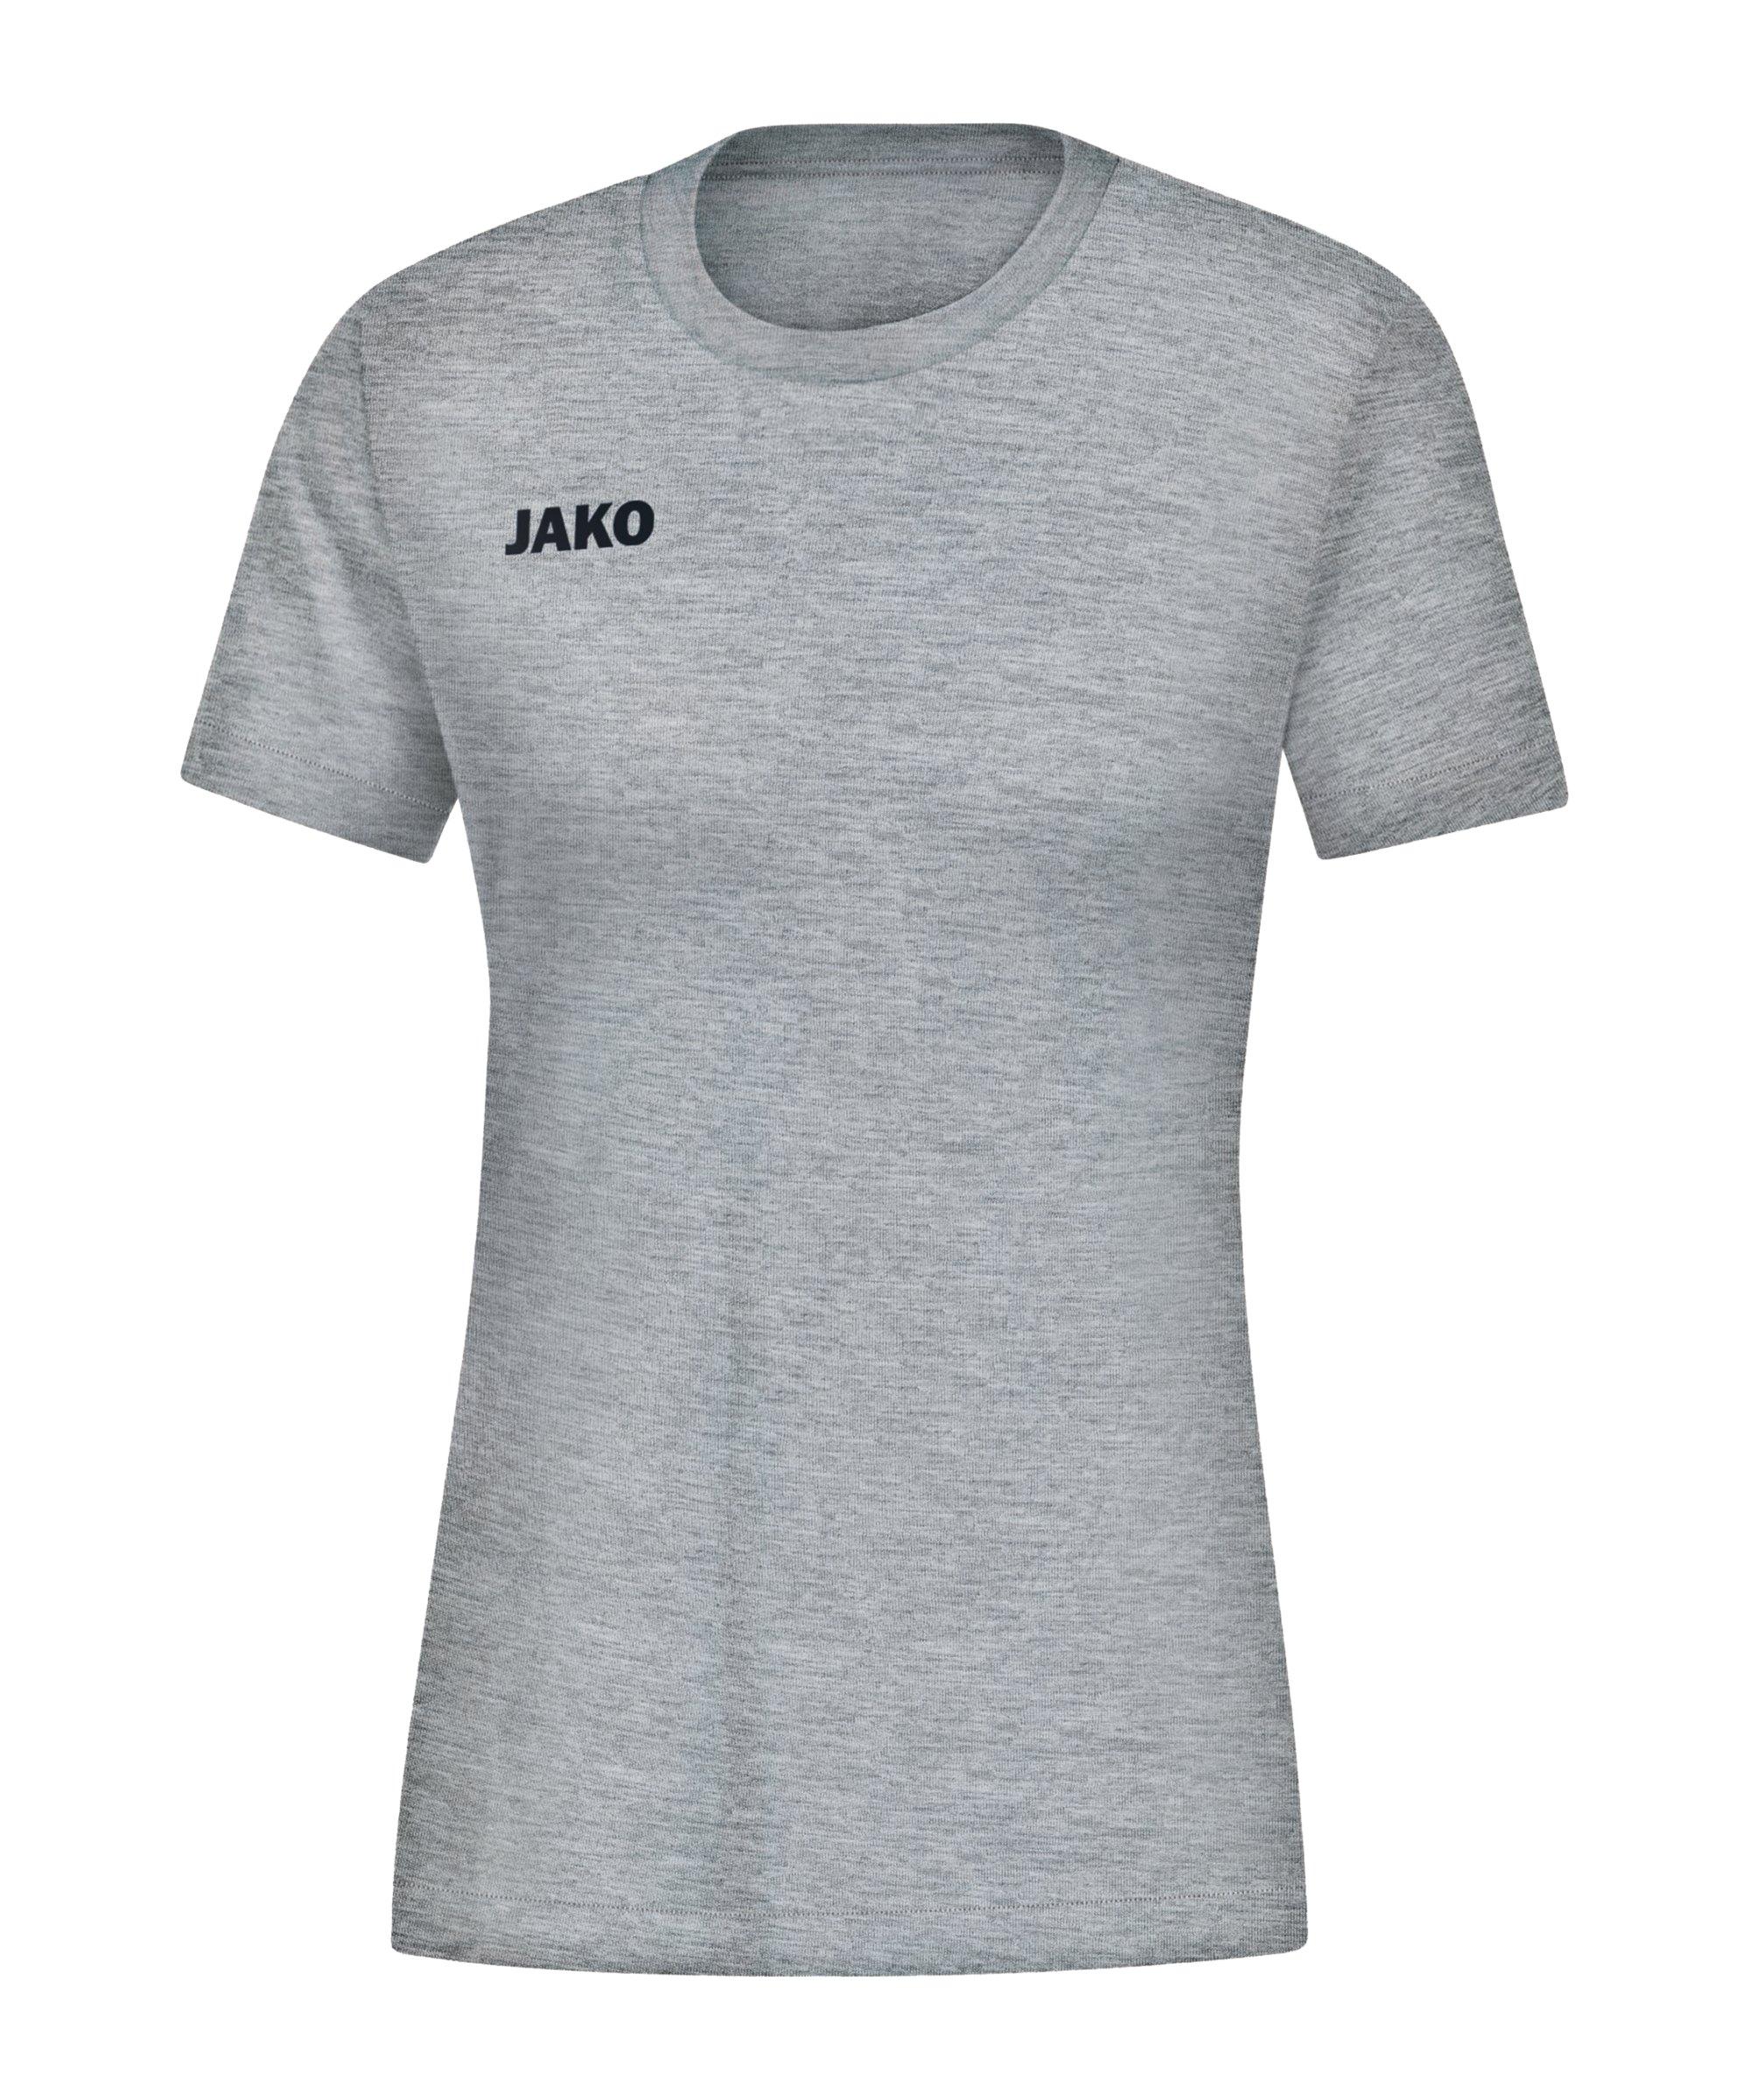 JAKO Base T-Shirt Damen Hellgrau F41 - grau